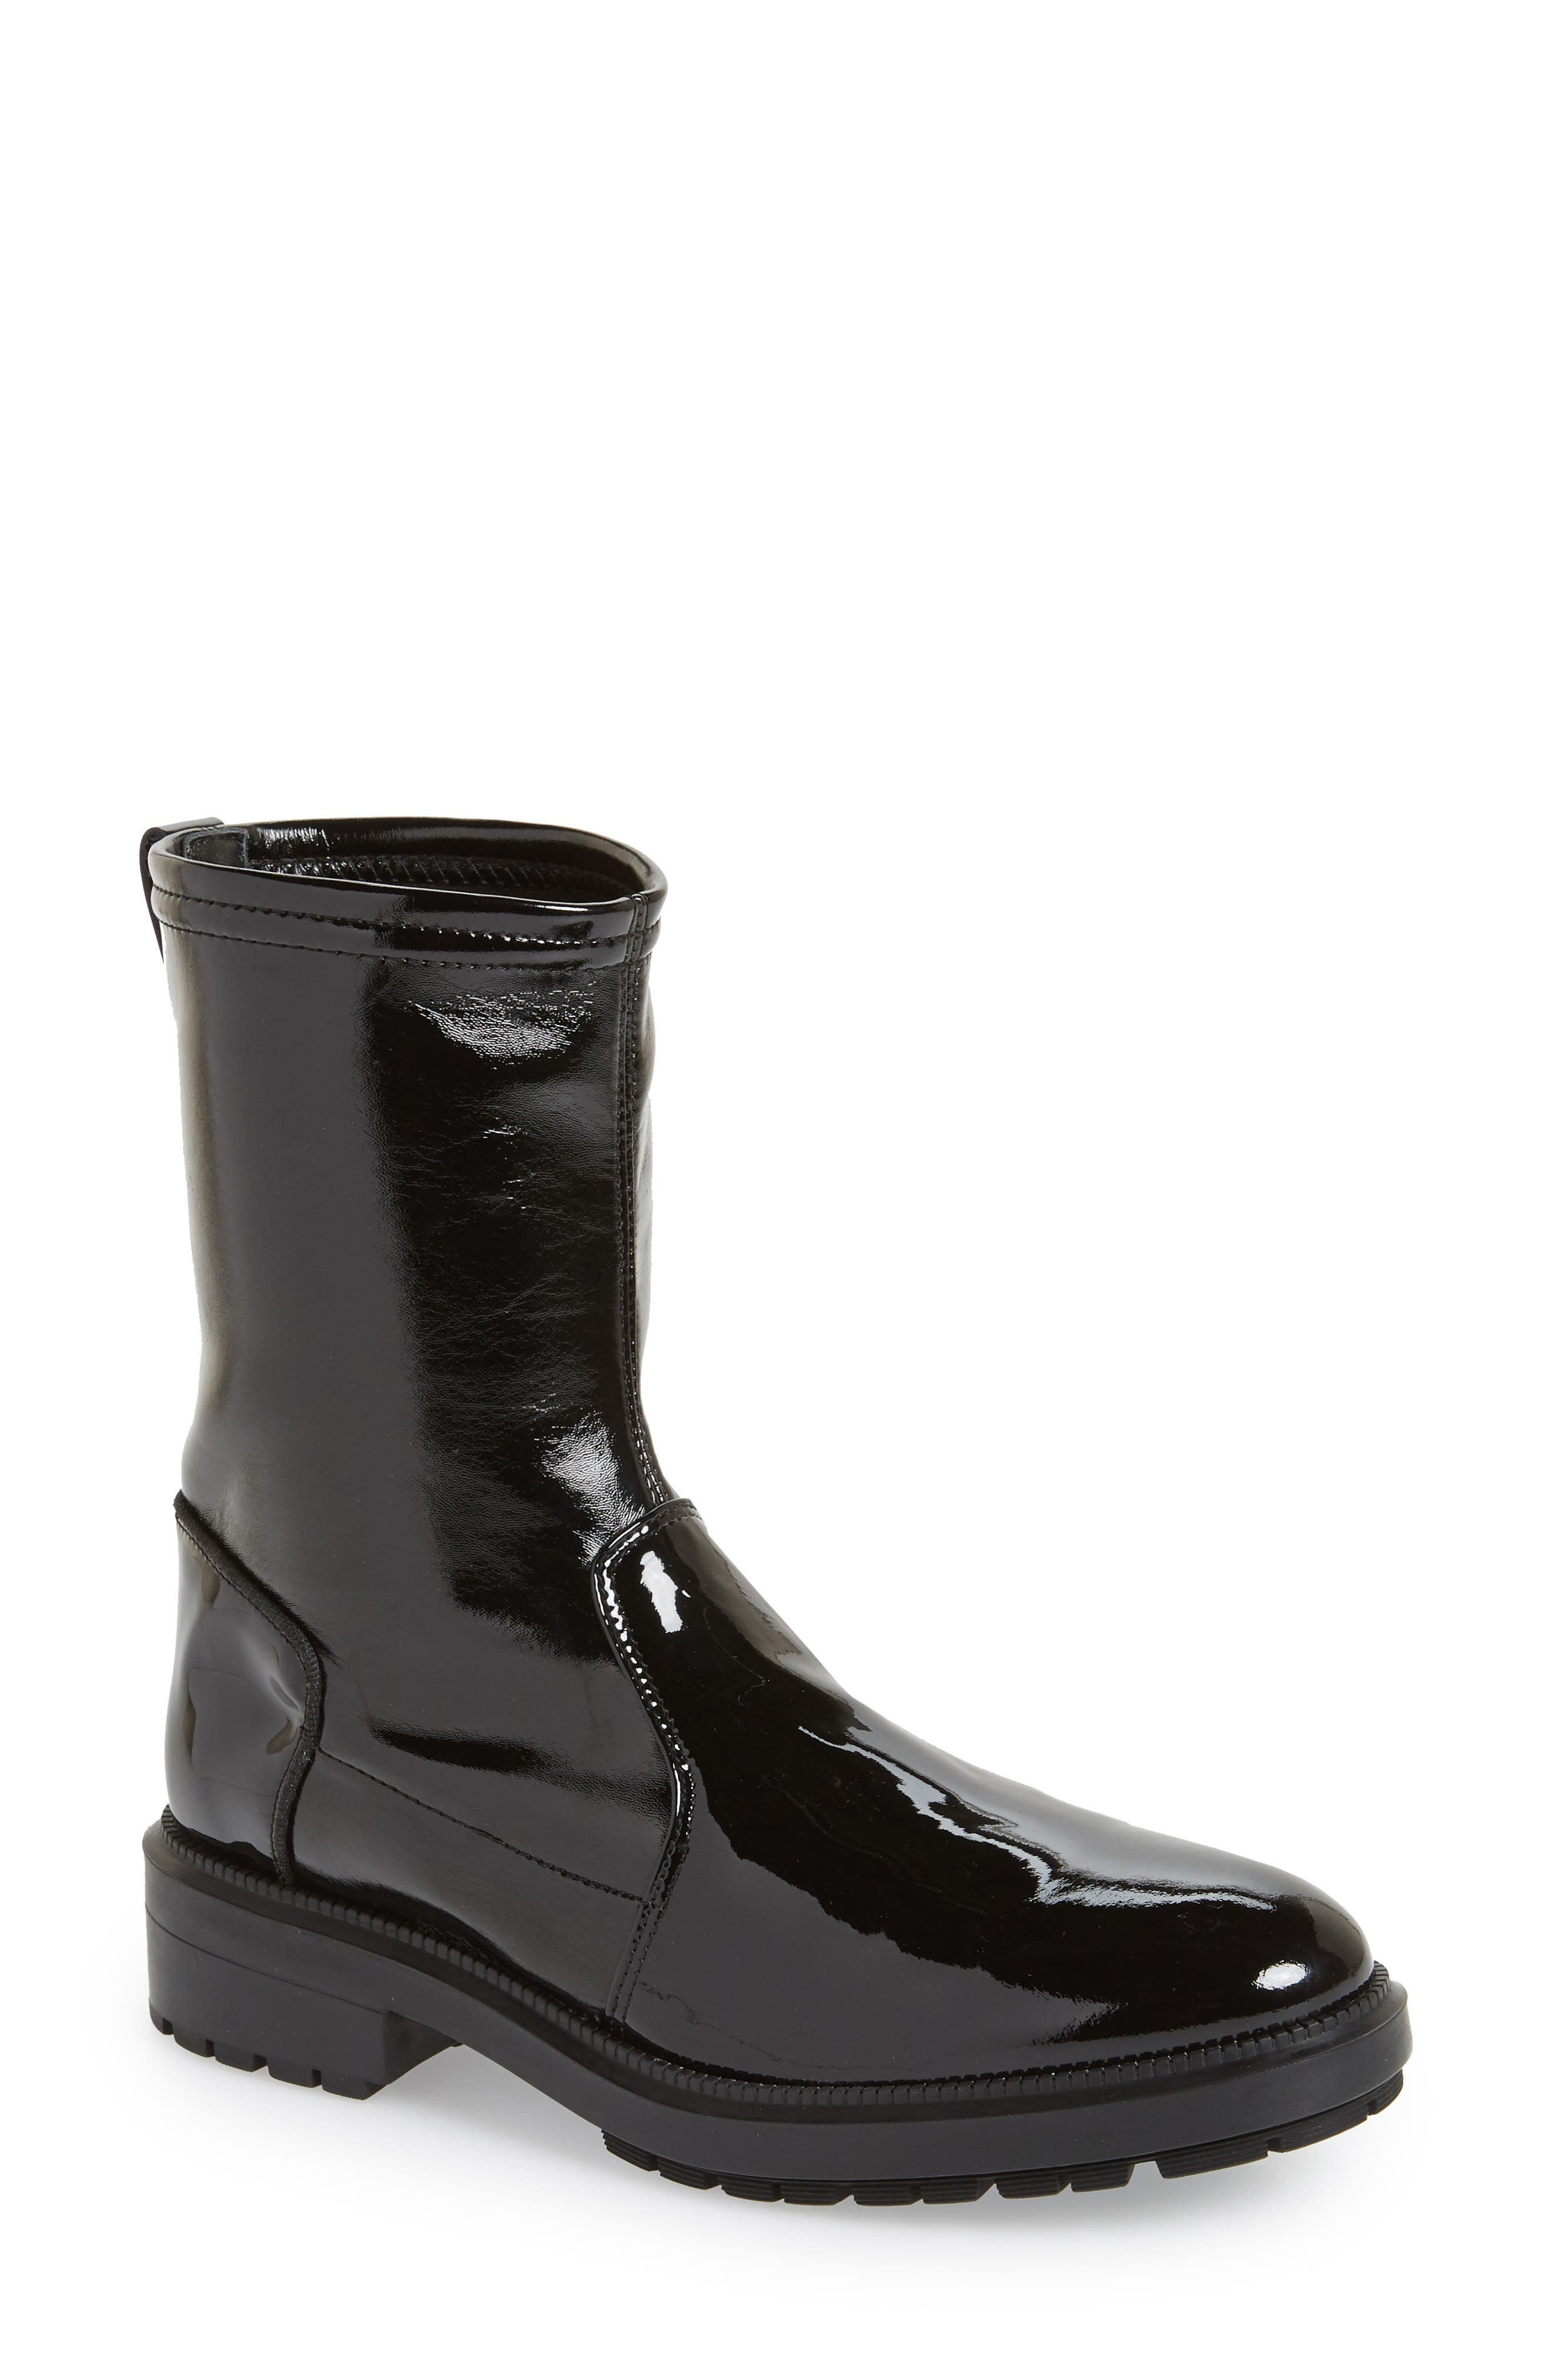 Aquatalia Leoda Ankle Water Resistant Boot